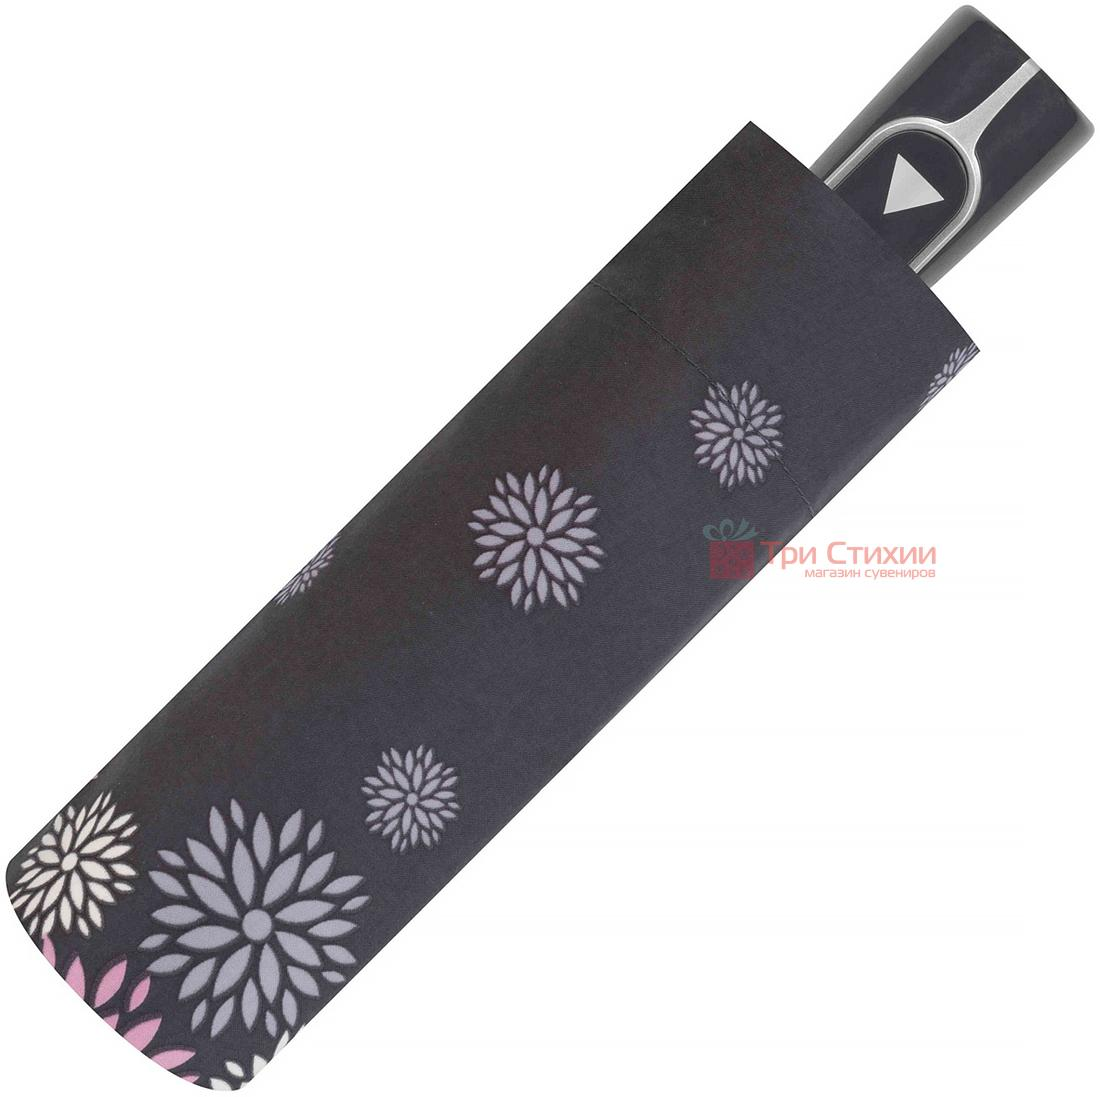 Зонт складной Doppler 7301652902-1 полуавтомат Серые цветы, Цвет: Серый, фото 2